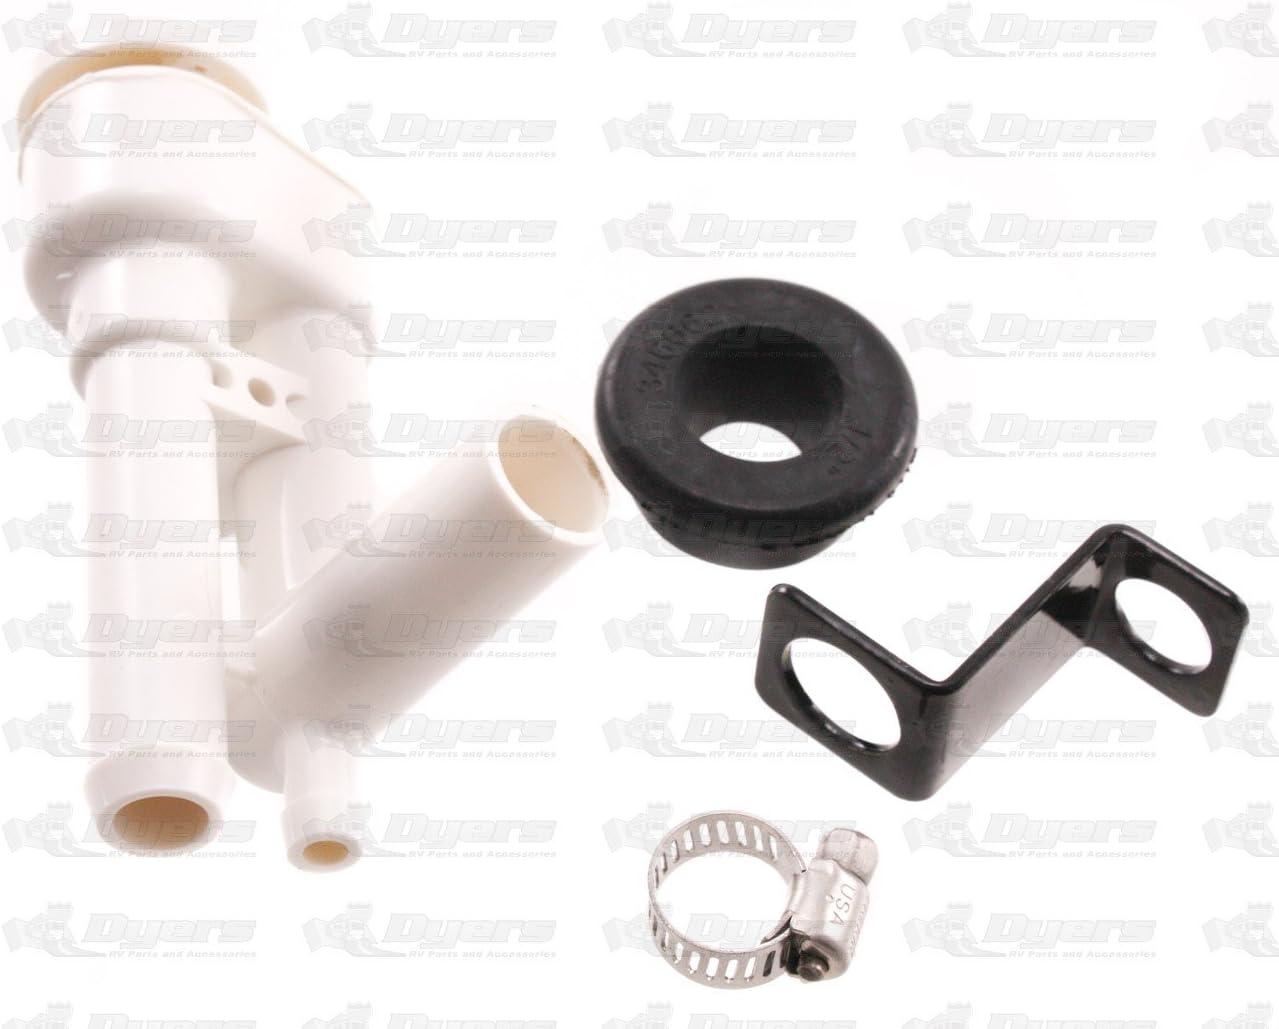 Dometic Popular 385230335 Traveler Lite Vacuum with Popular Kit Breaker Spray